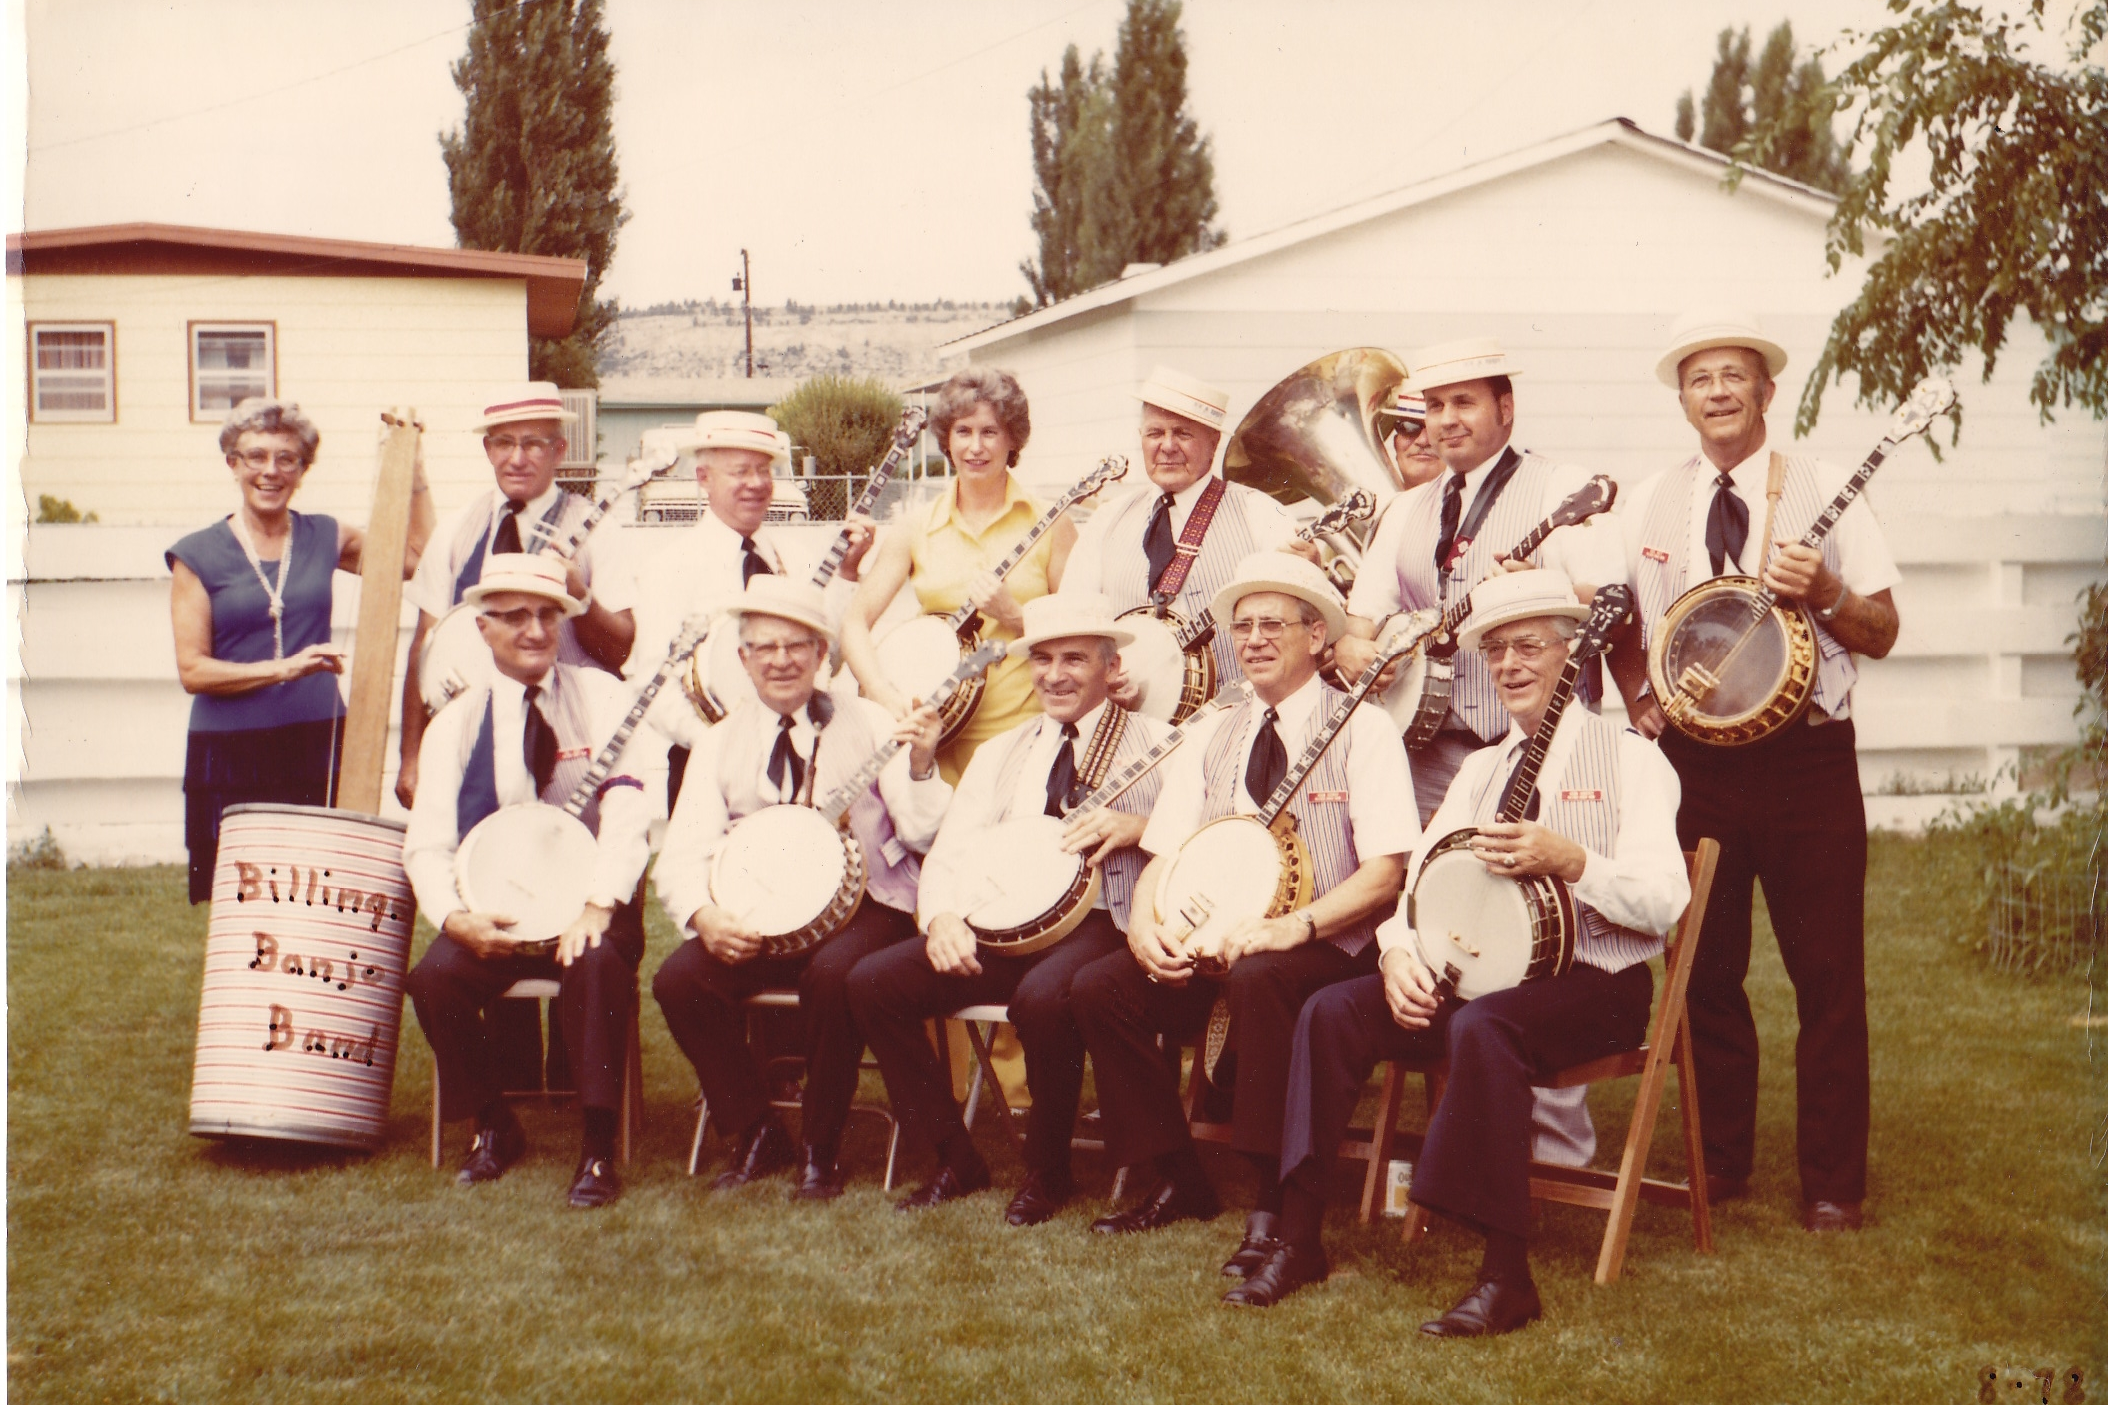 Billings Banjo Band, 1978